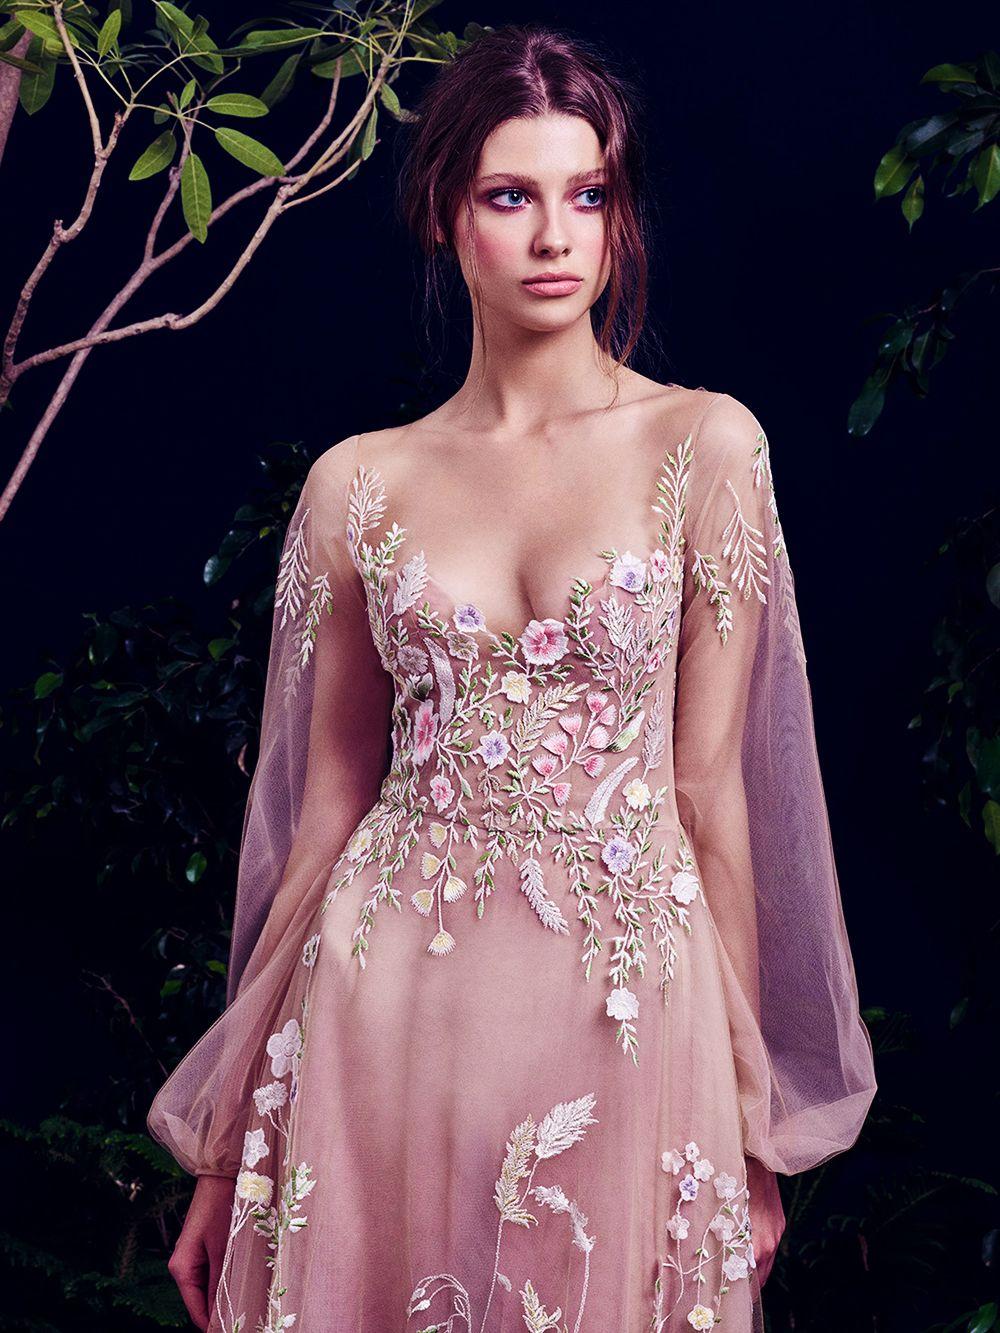 Encantador Trajes De Baile Tumblr Modelo - Colección de Vestidos de ...